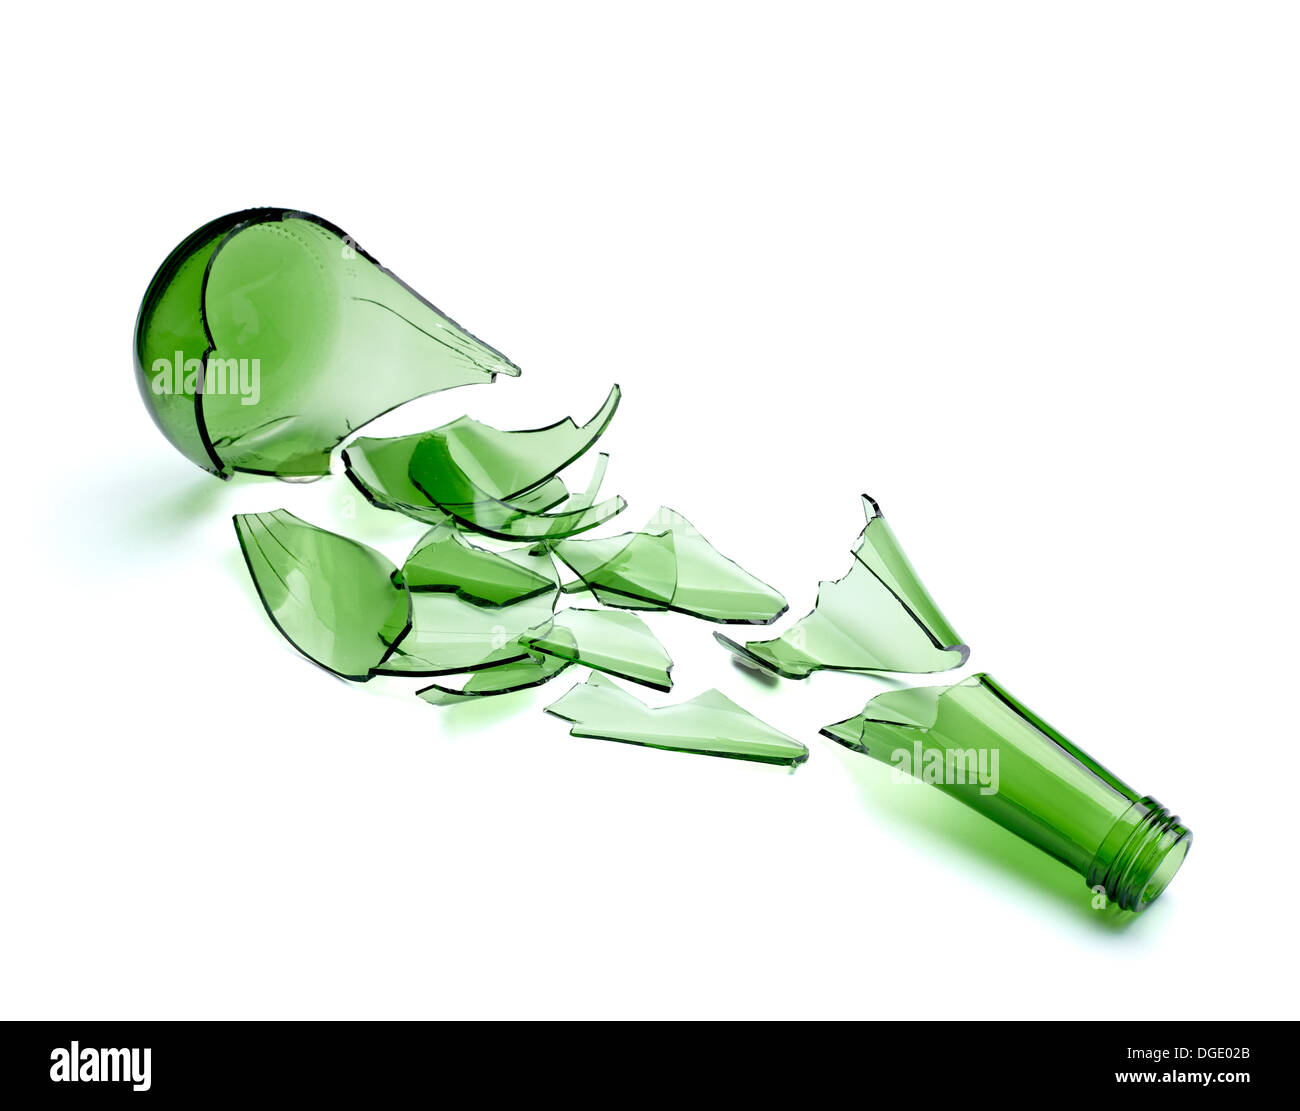 zerbrochenes glas flasche stockfoto bild 61772995 alamy. Black Bedroom Furniture Sets. Home Design Ideas